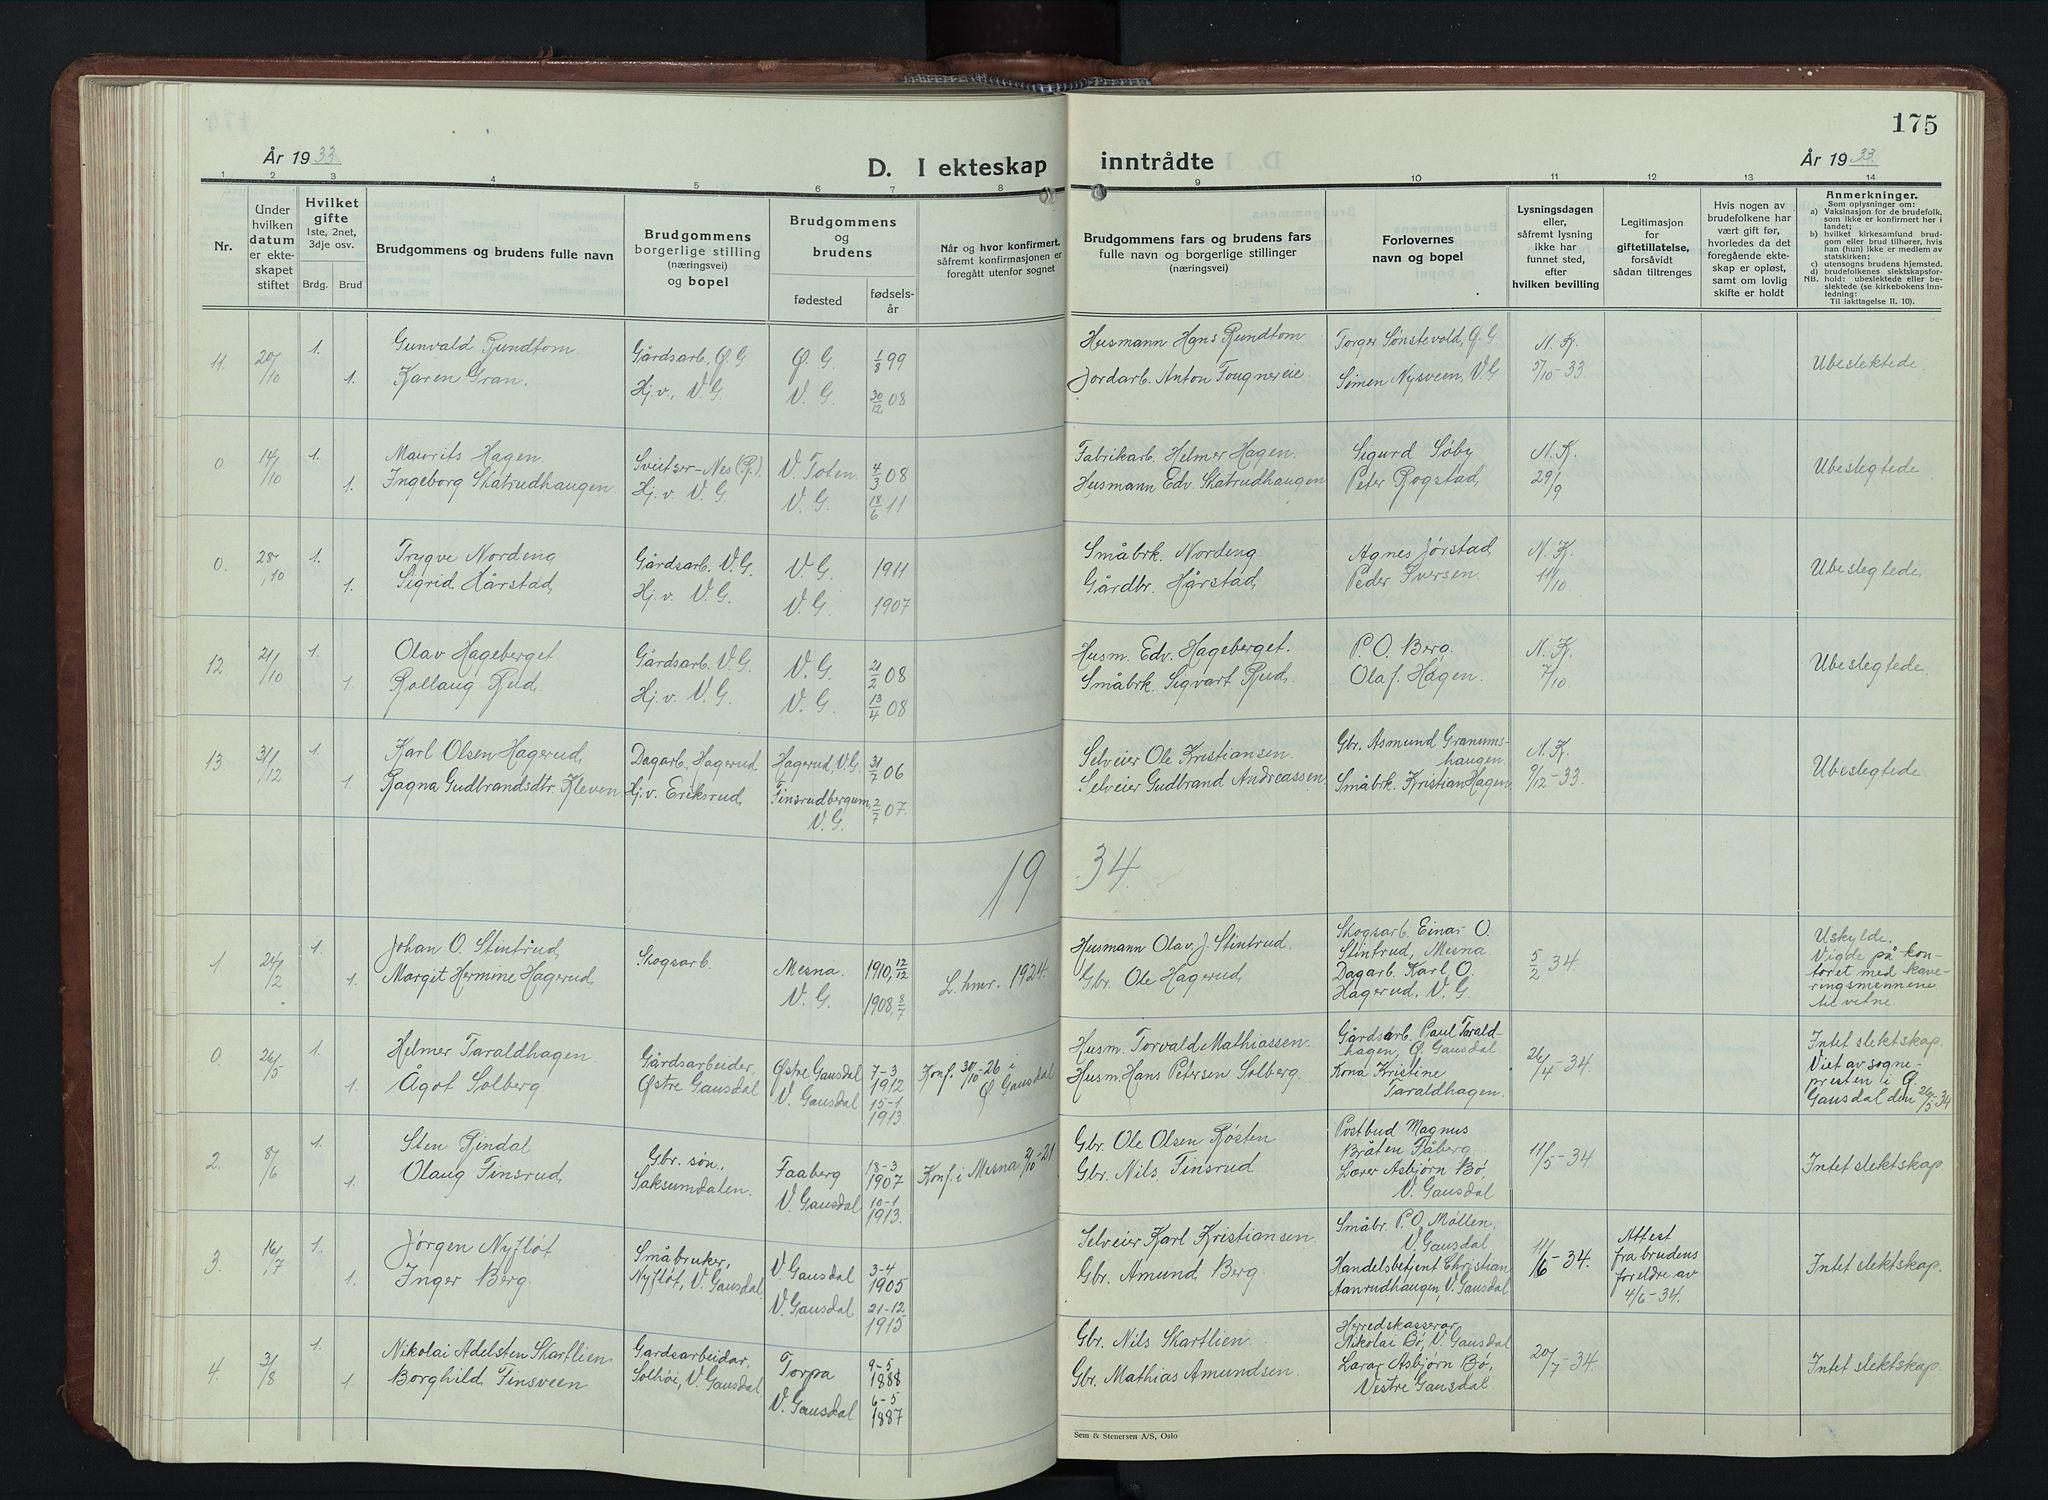 SAH, Vestre Gausdal prestekontor, Klokkerbok nr. 5, 1926-1955, s. 175